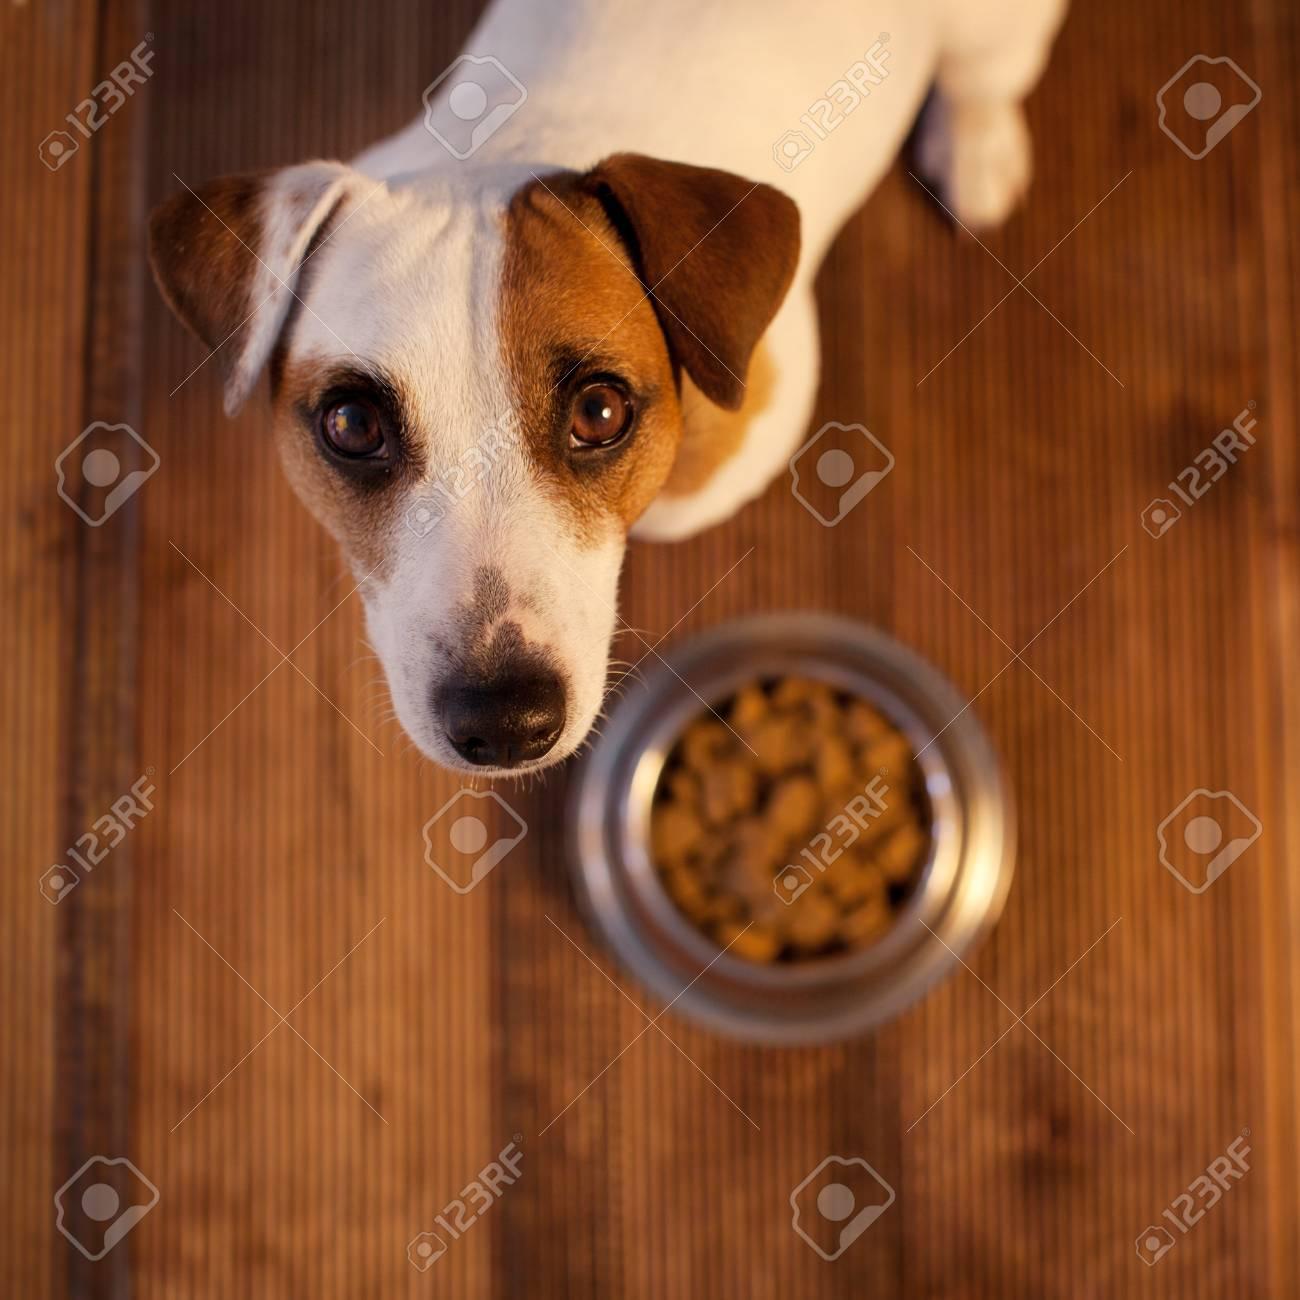 Pet eating food - 125958817